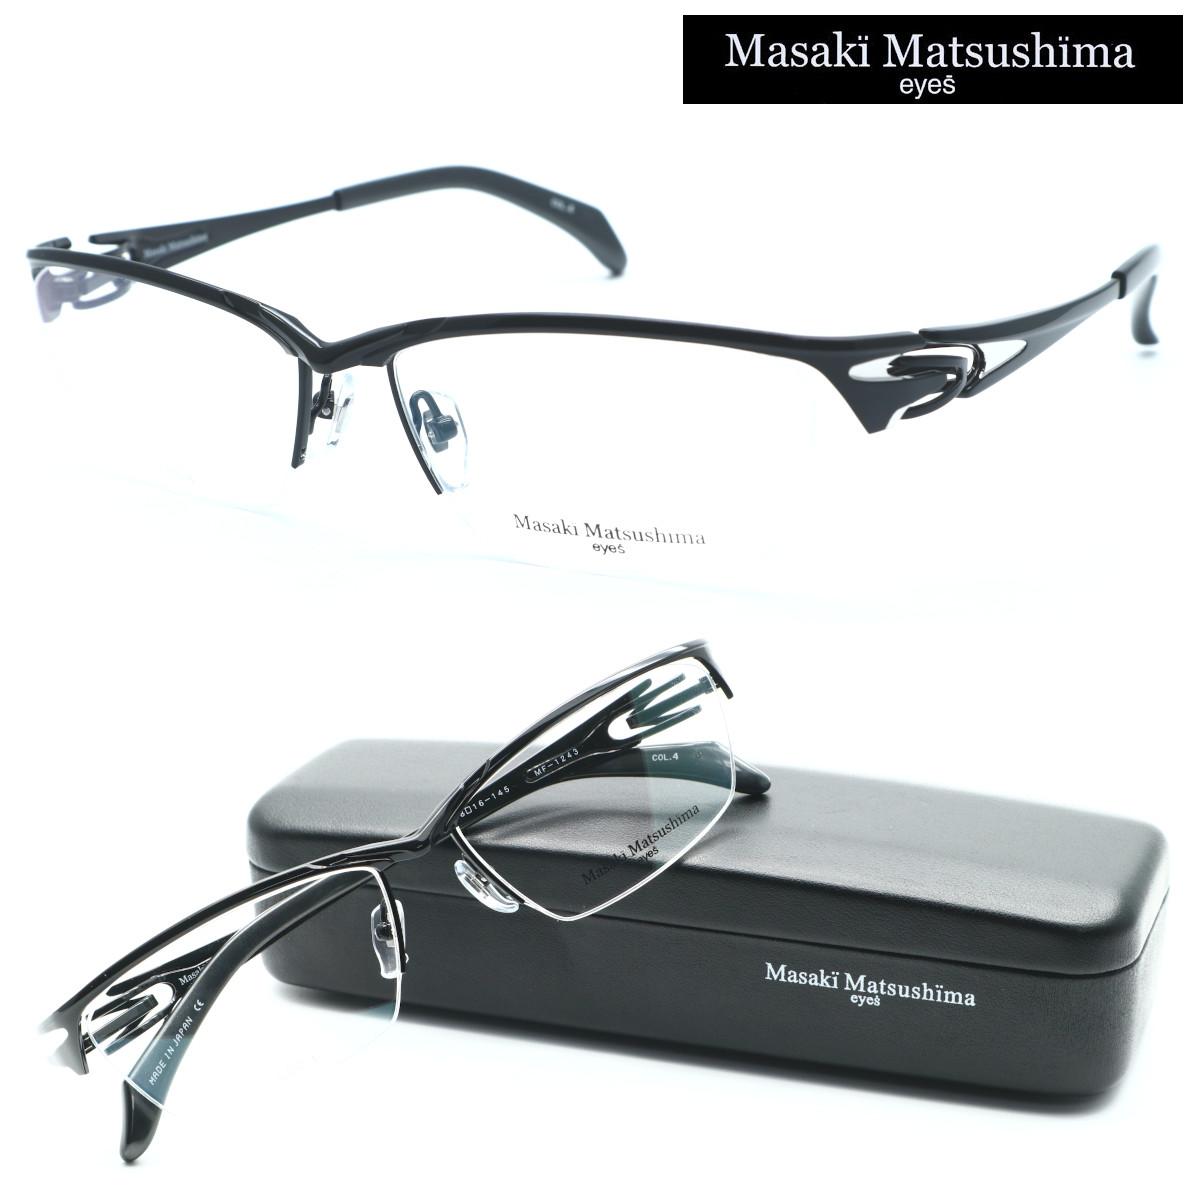 【Masaki Matsushima】マサキマツシマ MF-1243 col.4 メガネ 度付又は度無レンズセット【正規品】【店内全品送料無料】